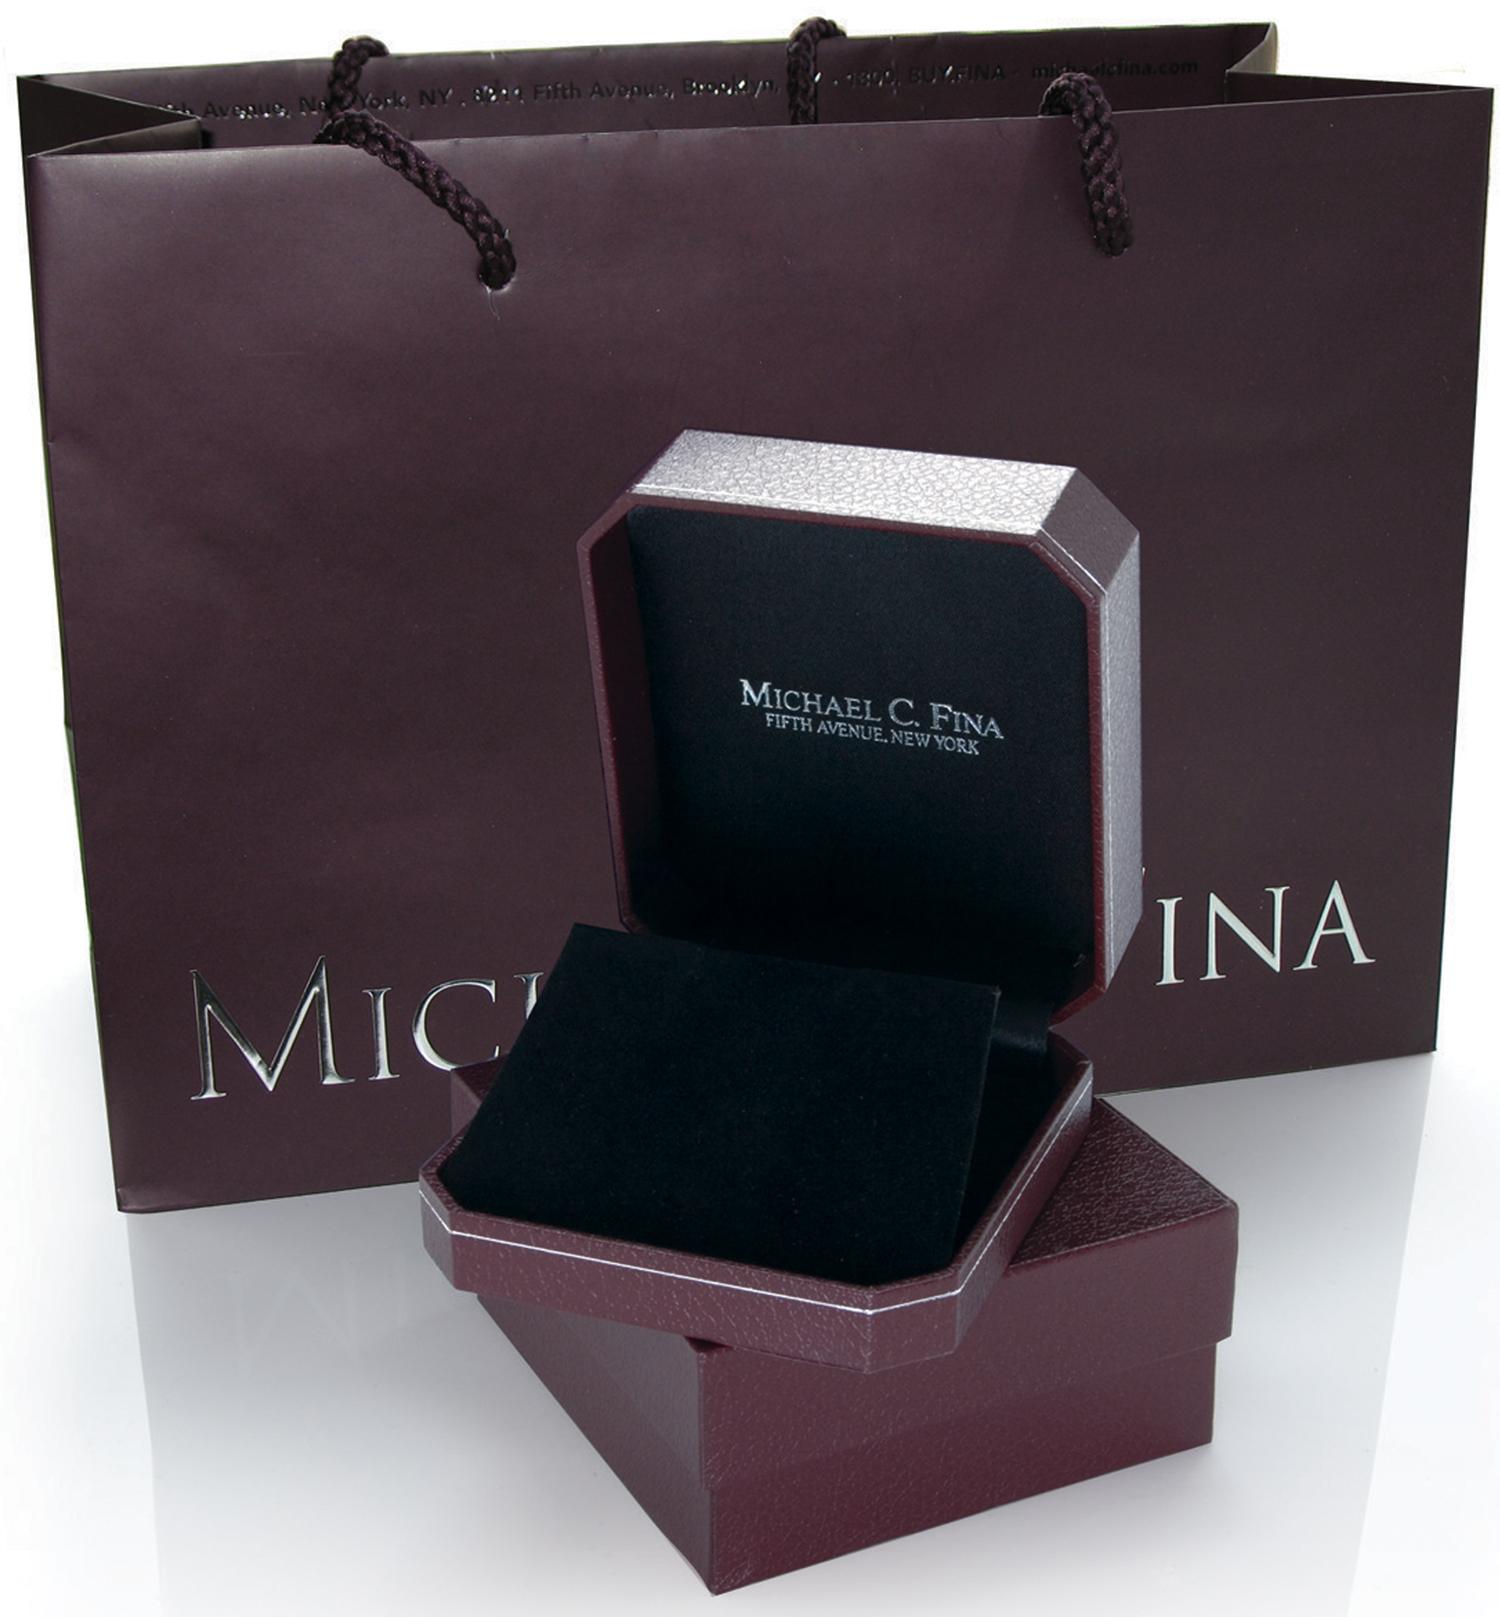 Michael C. Fina Packaging